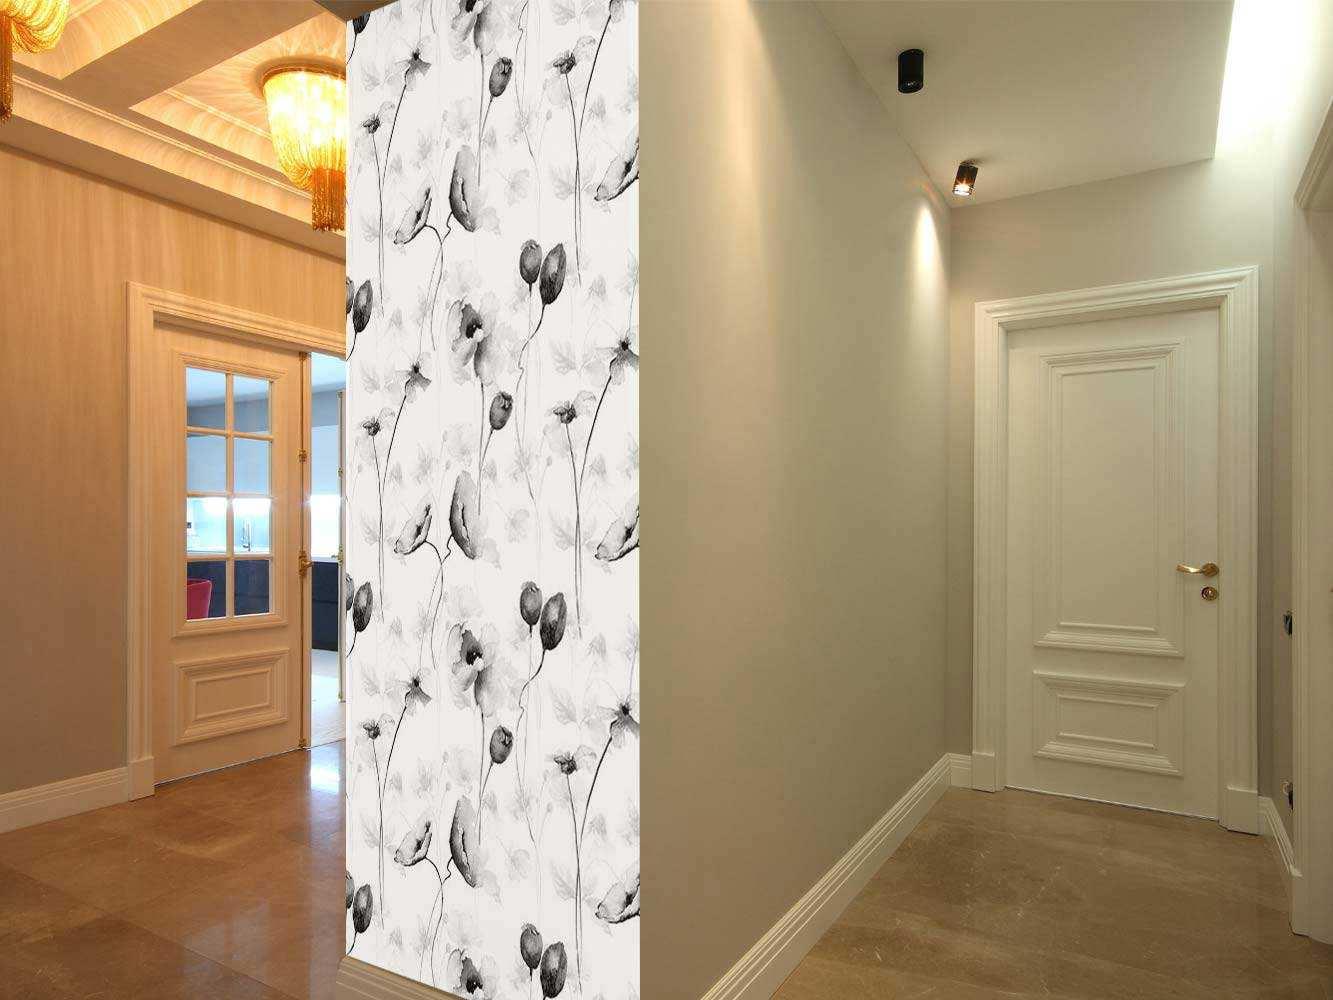 Cenefa Vertical Lirios en Blanco y Negro   Carteles XXL - Impresión carteleria publicitaria